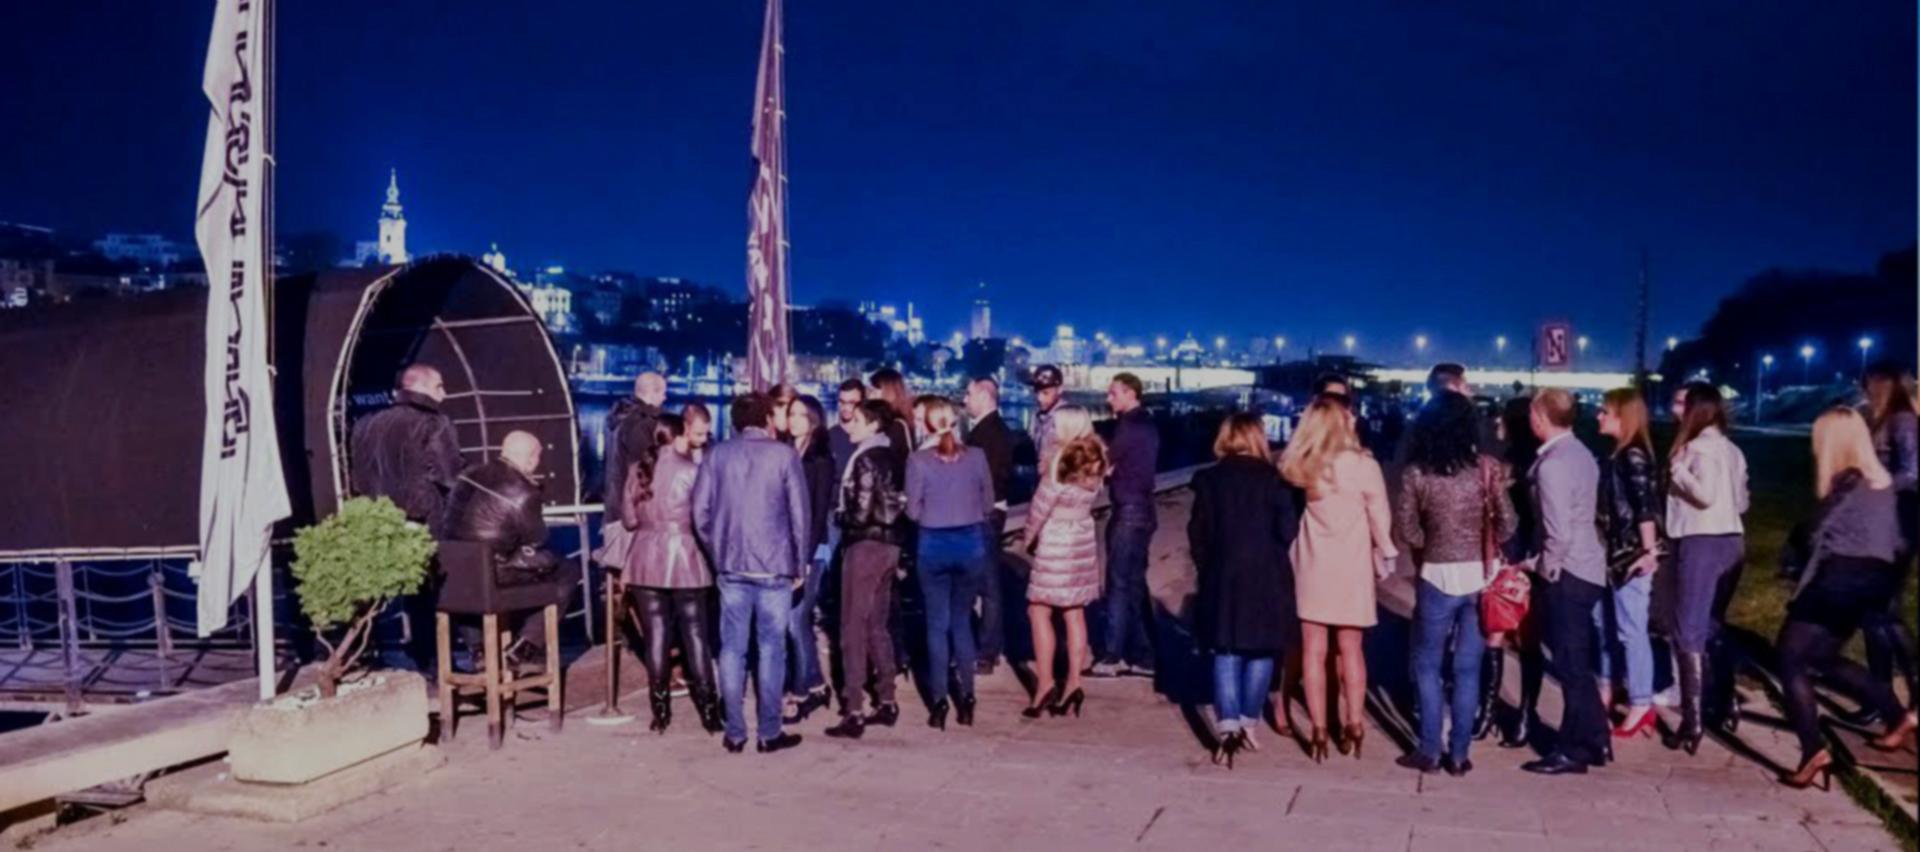 Night Club Service Image